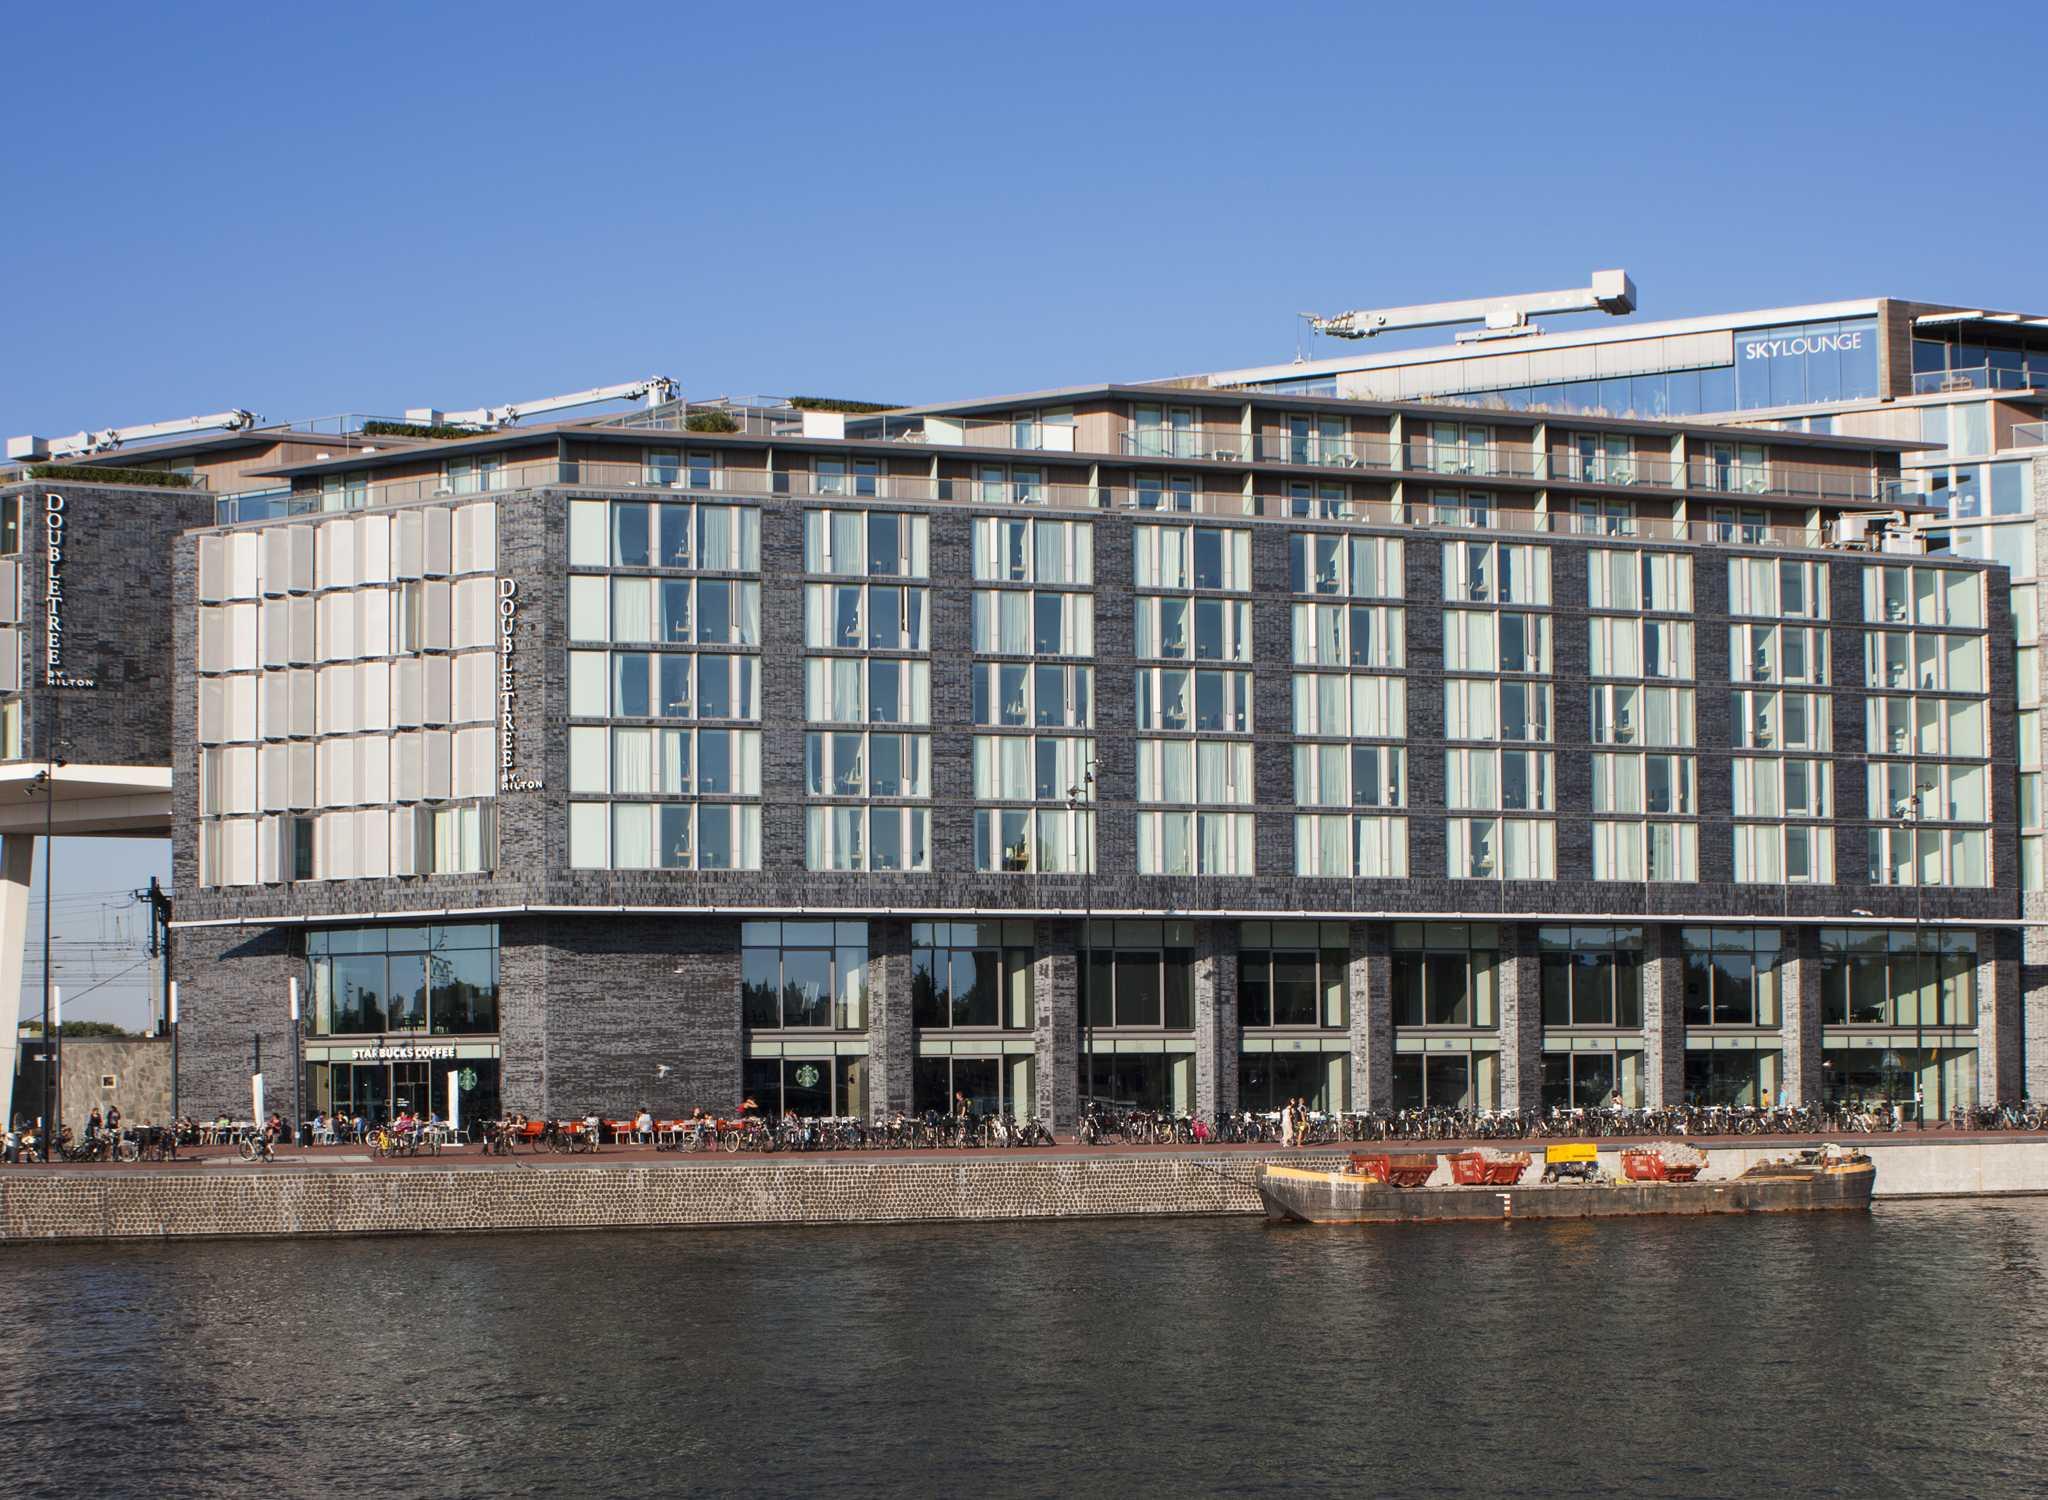 Hotel Herengracht Amsterdam